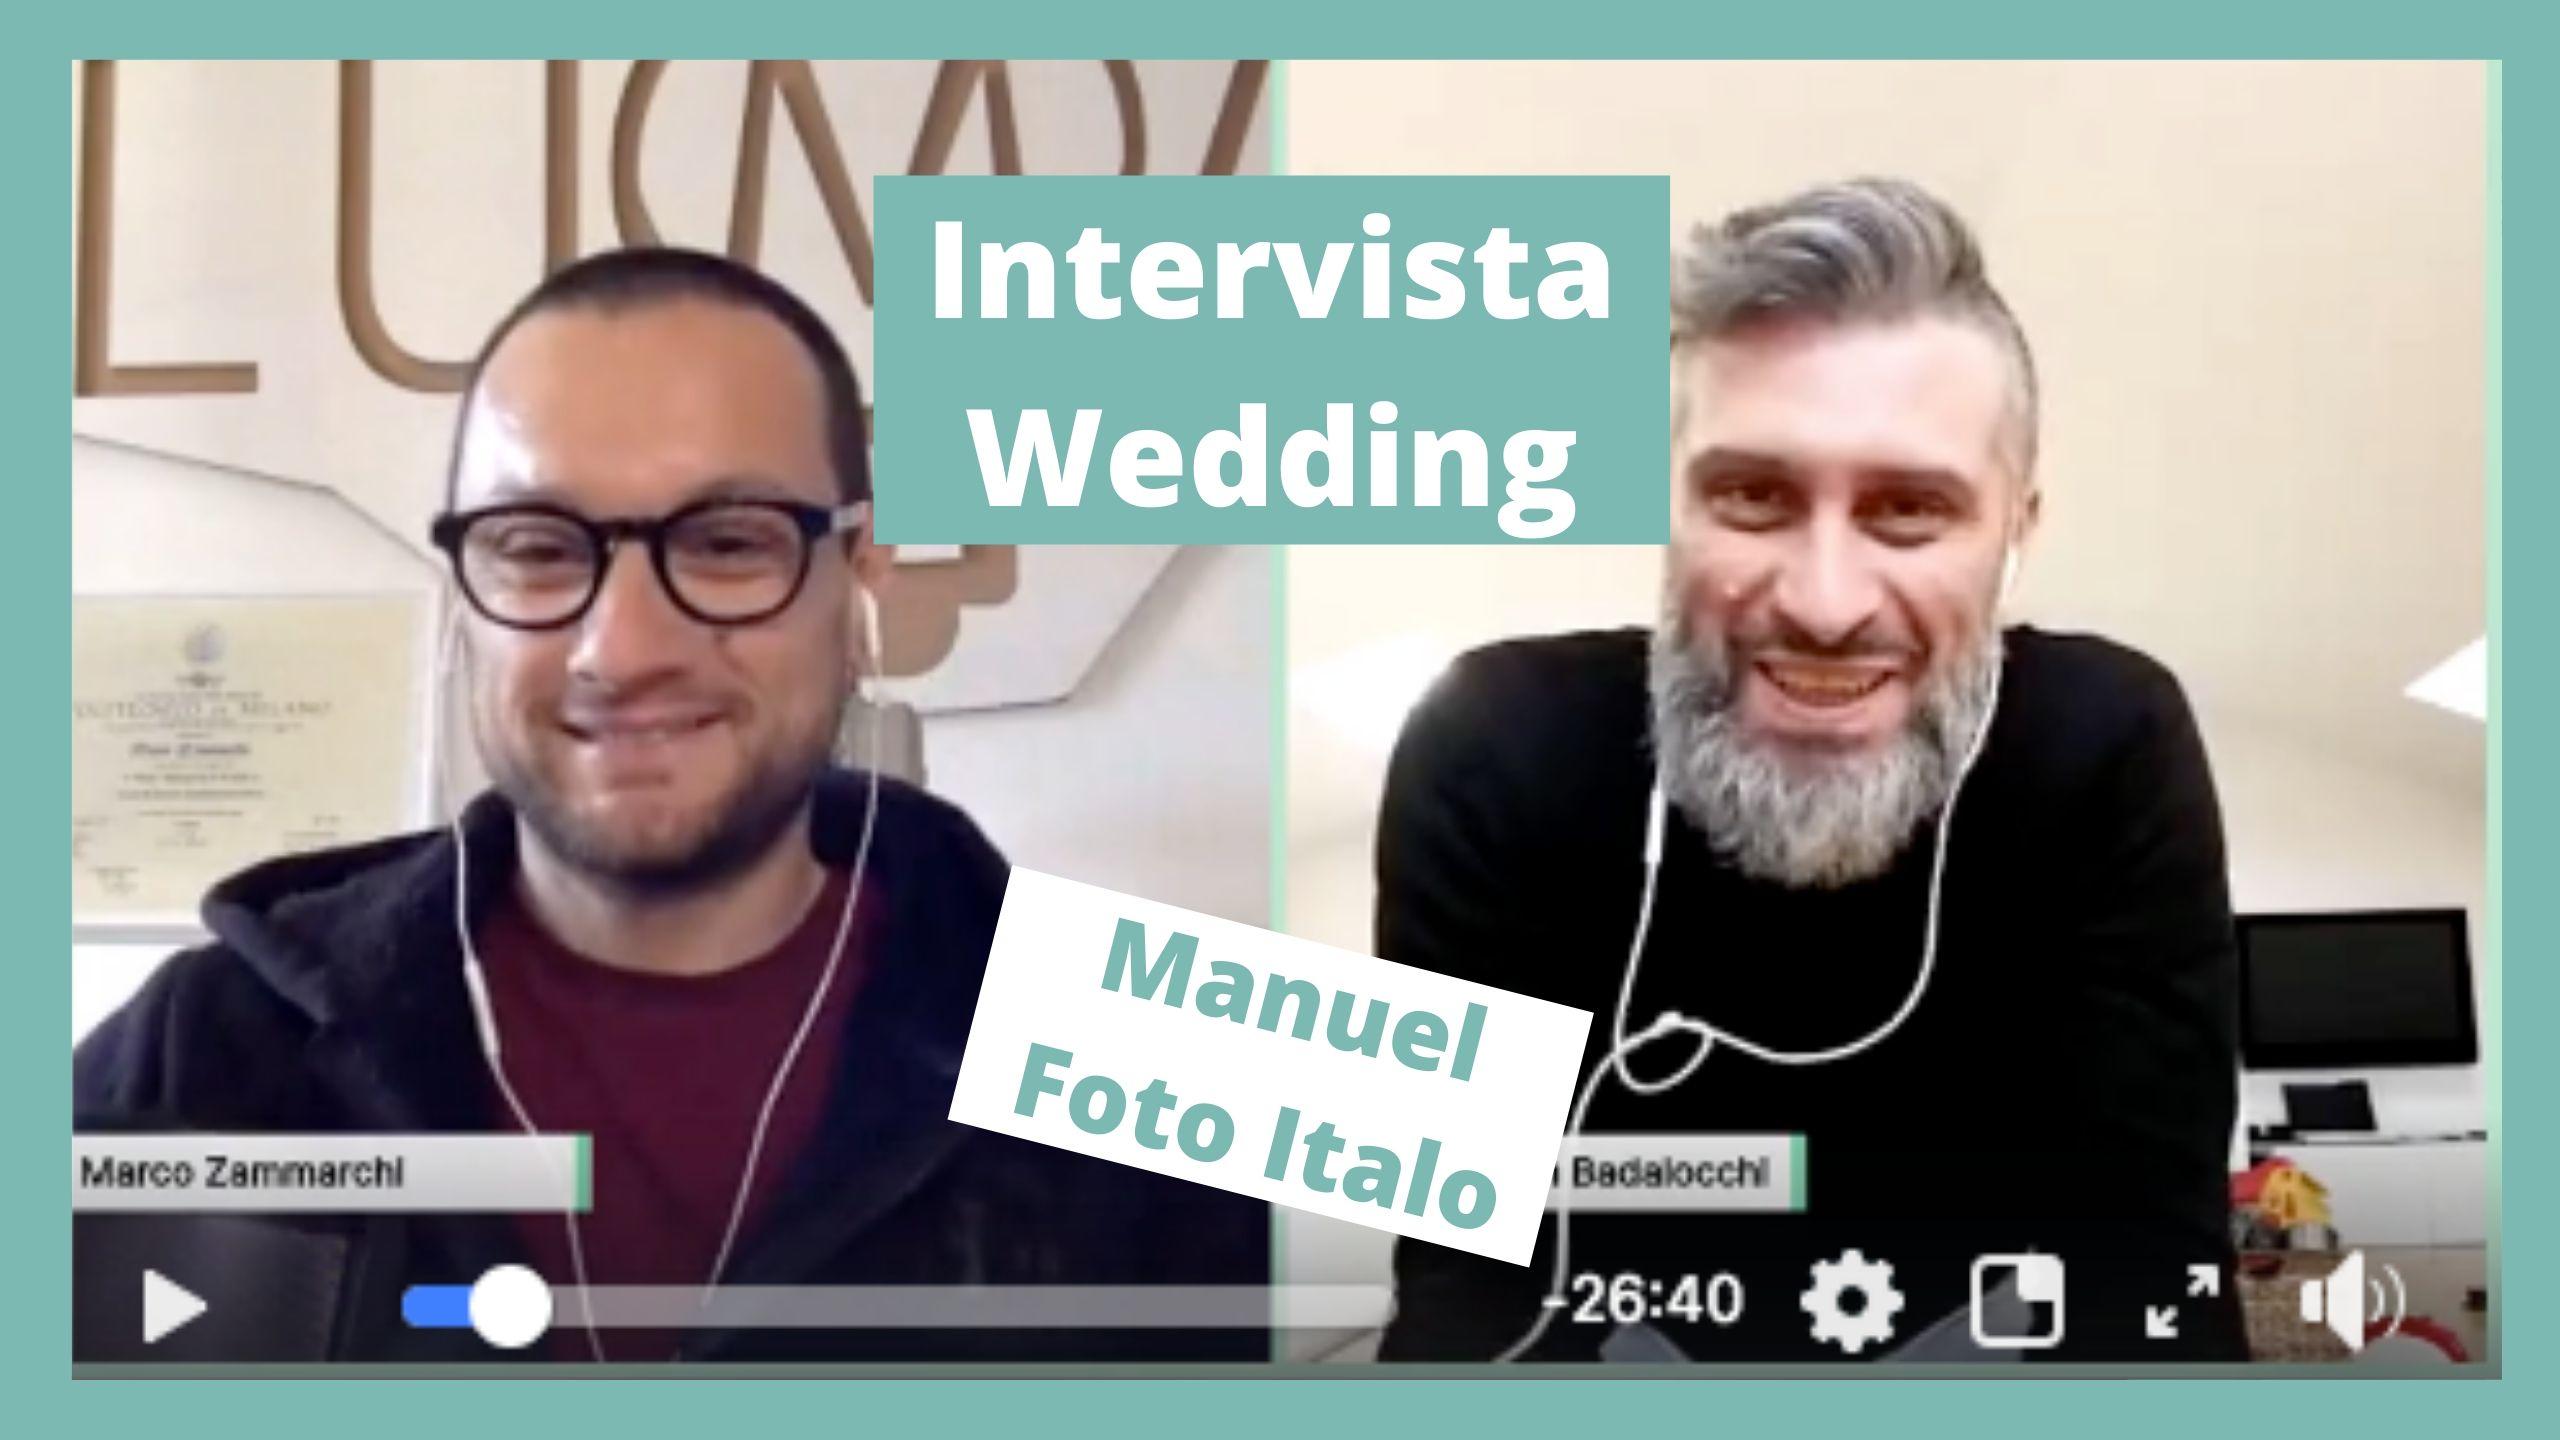 Intervista a Manuele Badalocchi